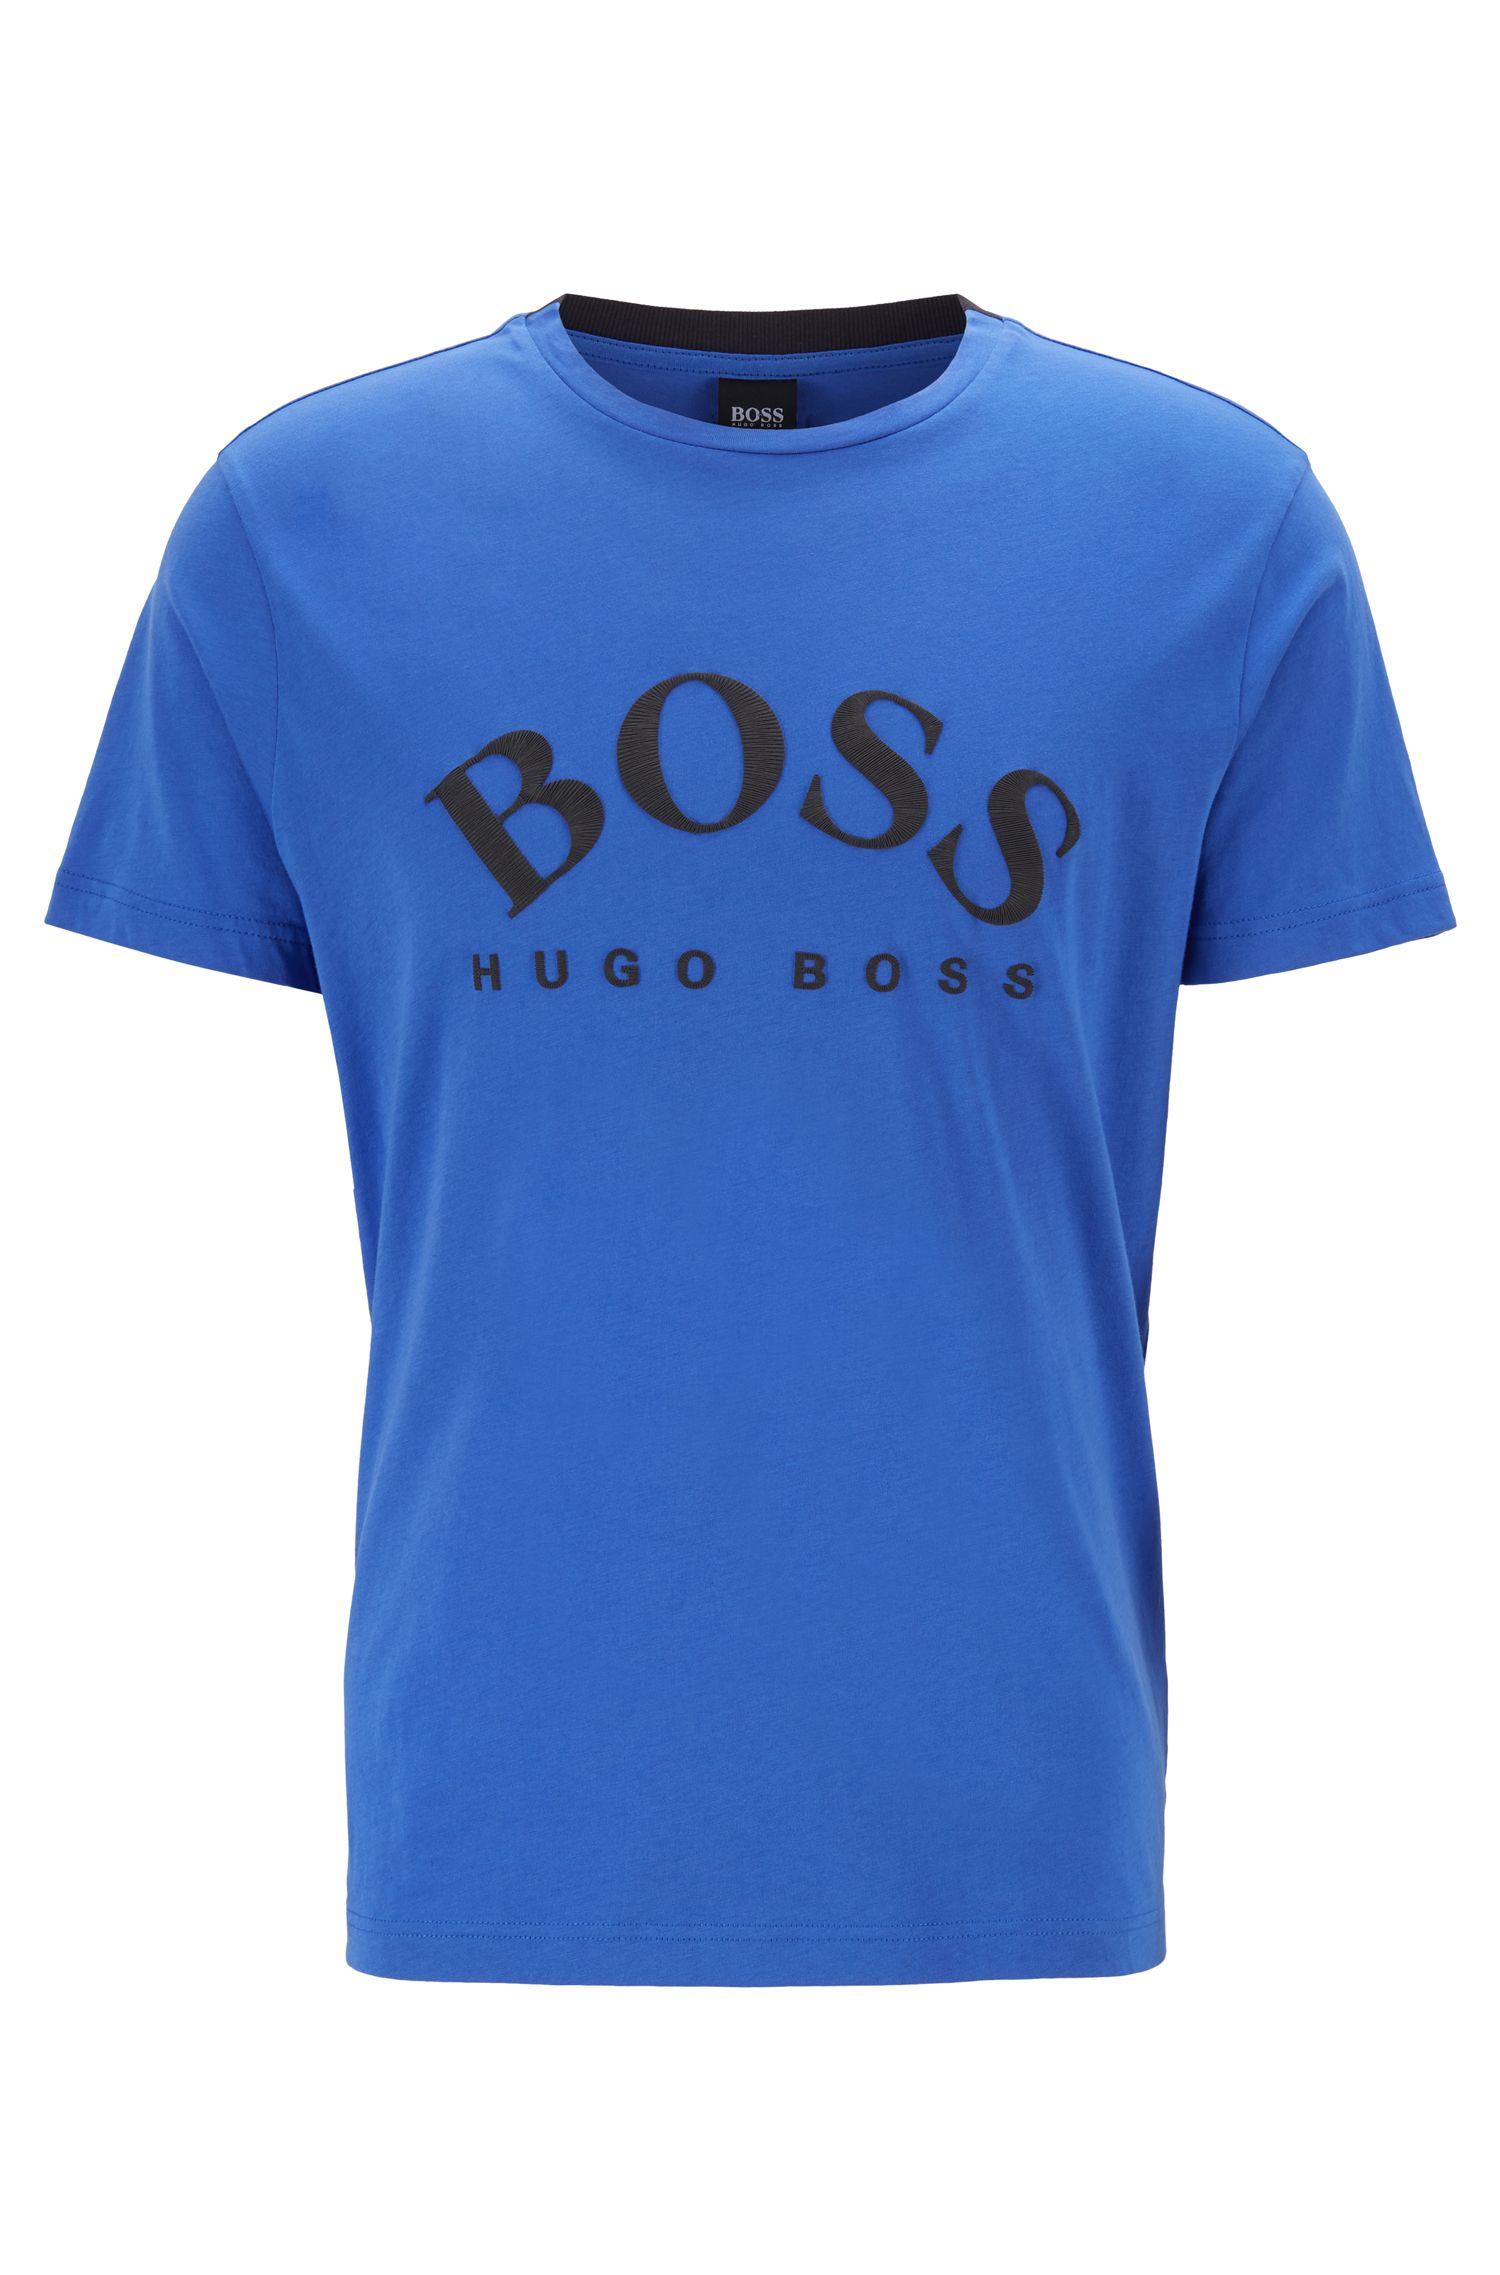 T-shirt à col rond et logo incurvé effet brodé, Bleu